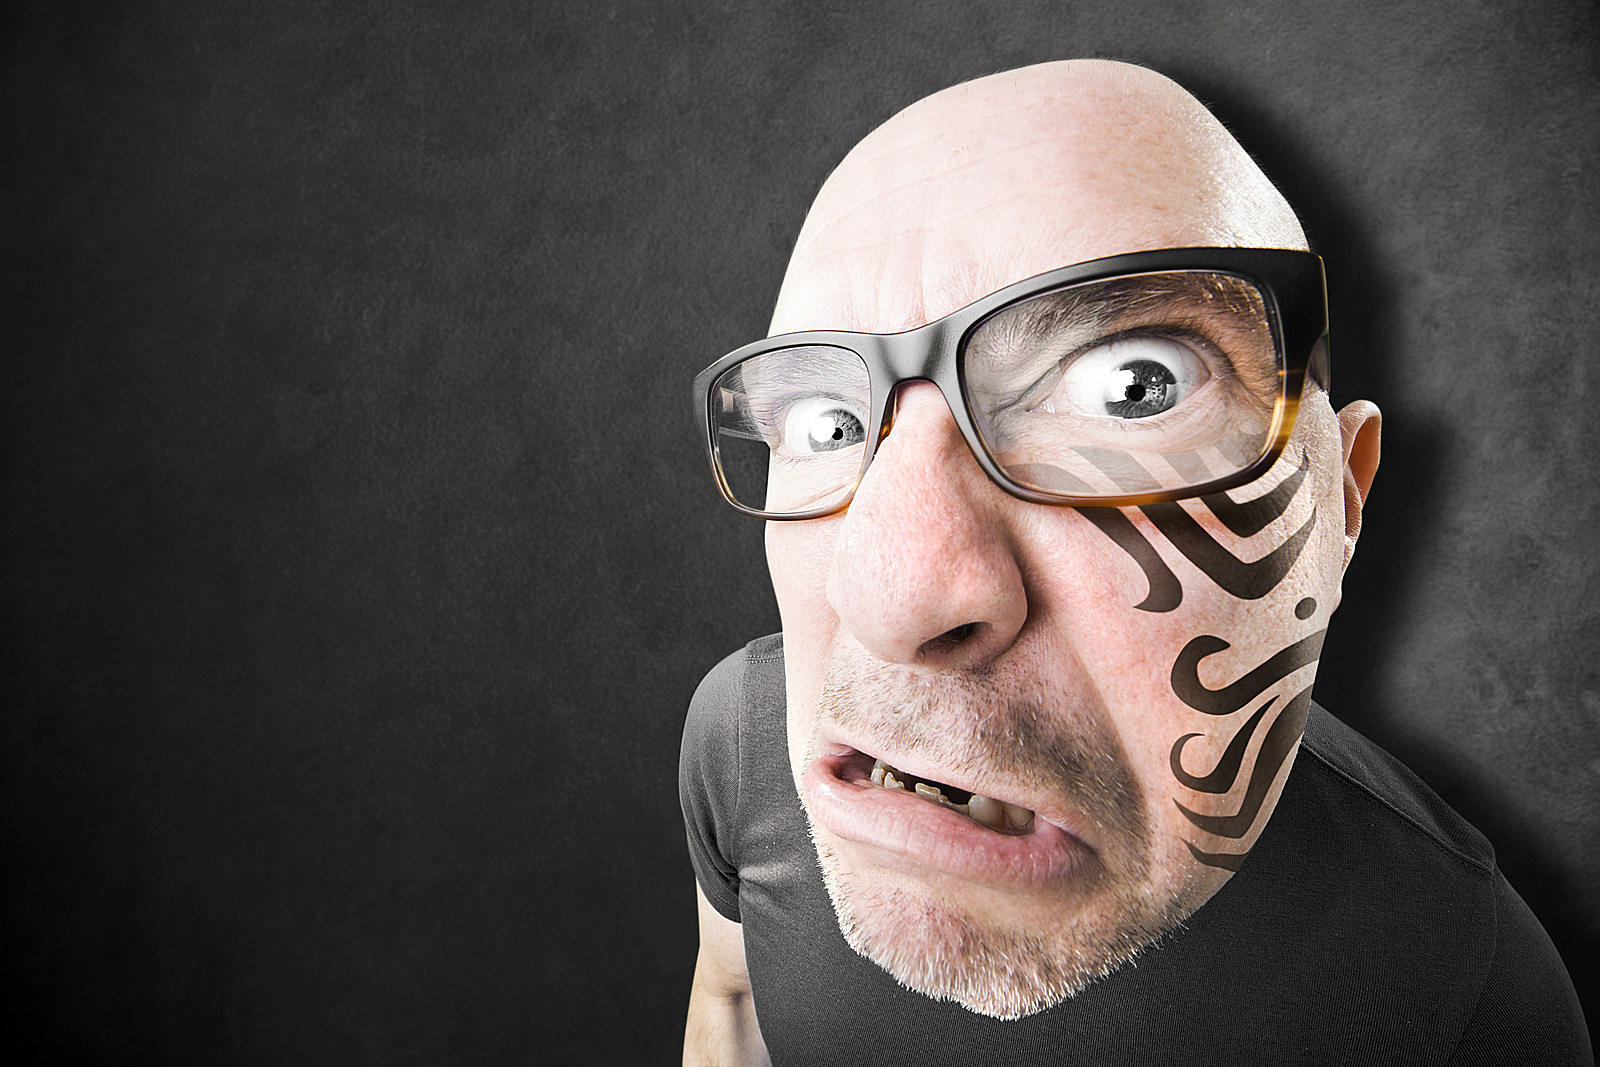 Big Rapids Podiatrist Opens Tattoo Removal Shop \'No Regerts\'